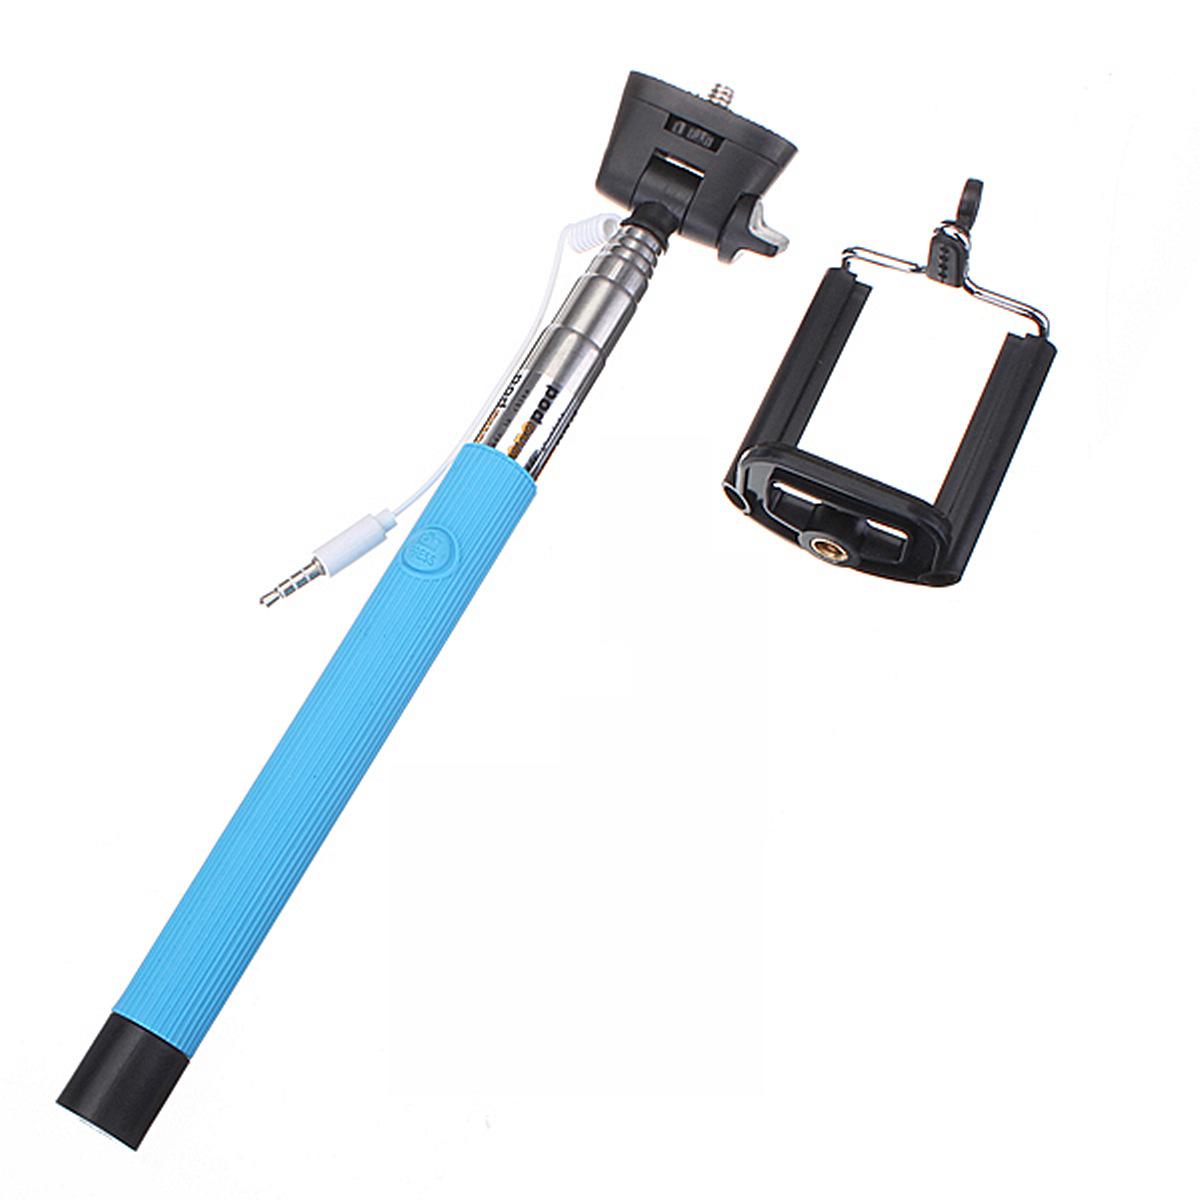 106cm telescopic handheld monopod selfie stick white lazada malaysia. Black Bedroom Furniture Sets. Home Design Ideas